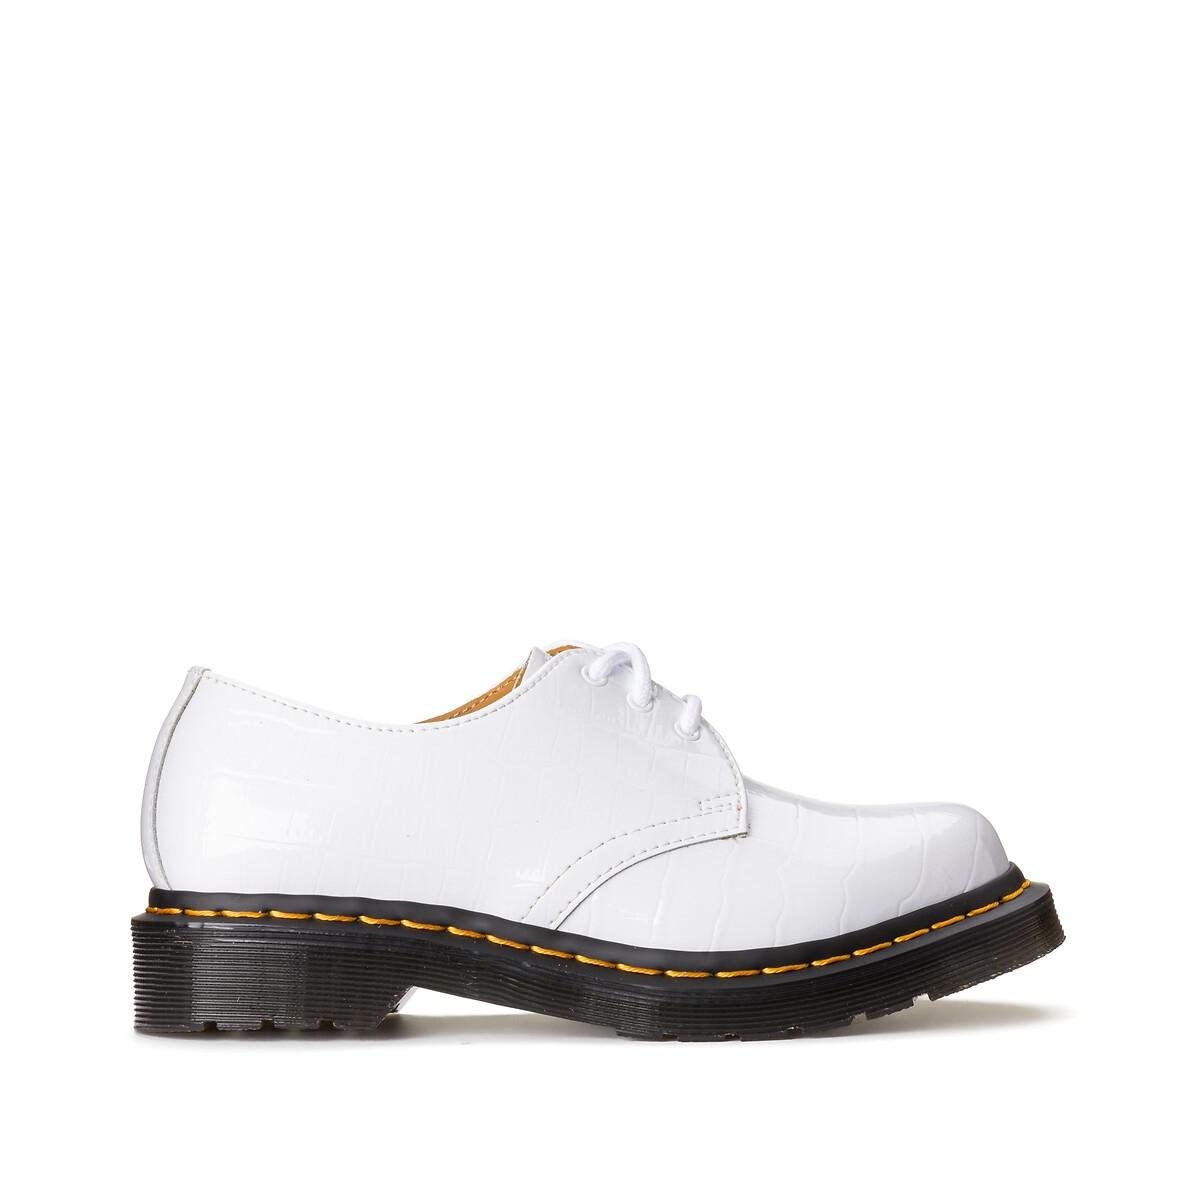 Ботинки-дерби LaRedoute Из лакированной кожи 1461 Croc Emboss 41 белый ботинки дерби из кожи teadale maira